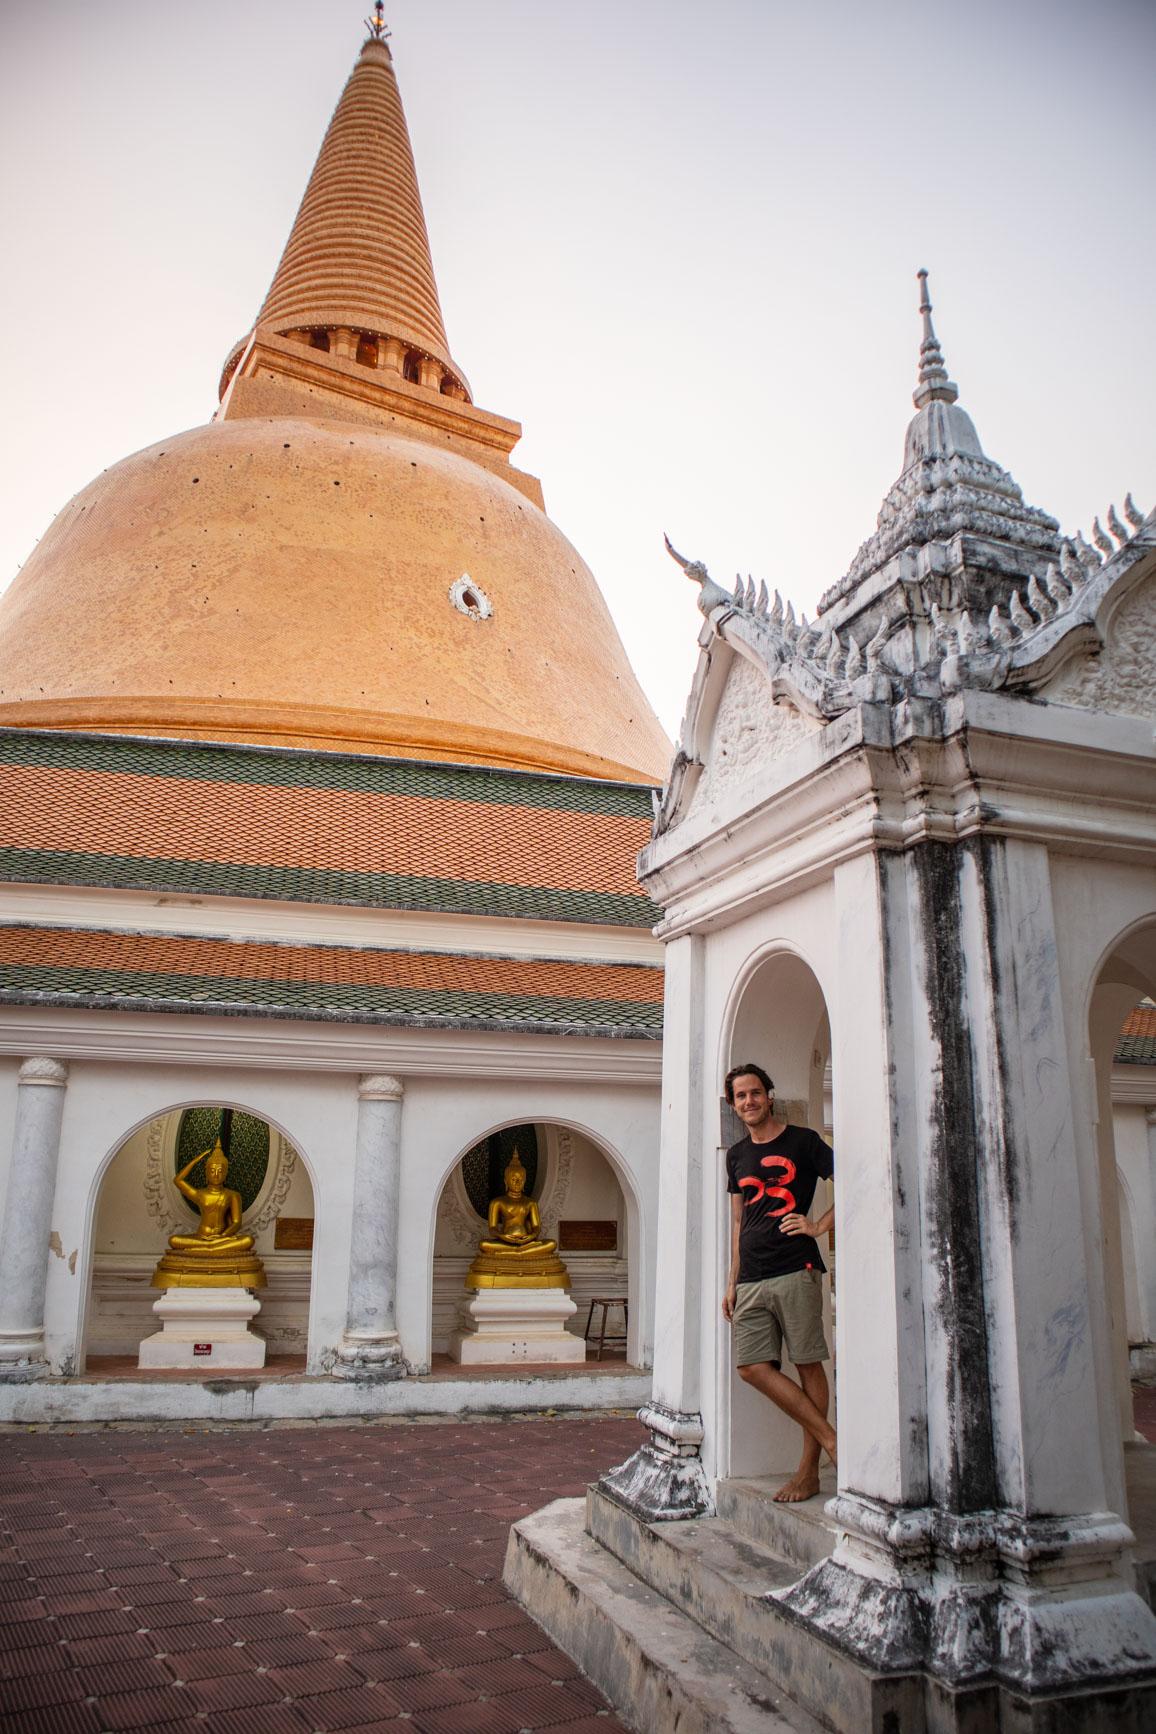 https://bubo.sk/uploads/galleries/7534/tomashornak_thajsko_img_0109.jpg